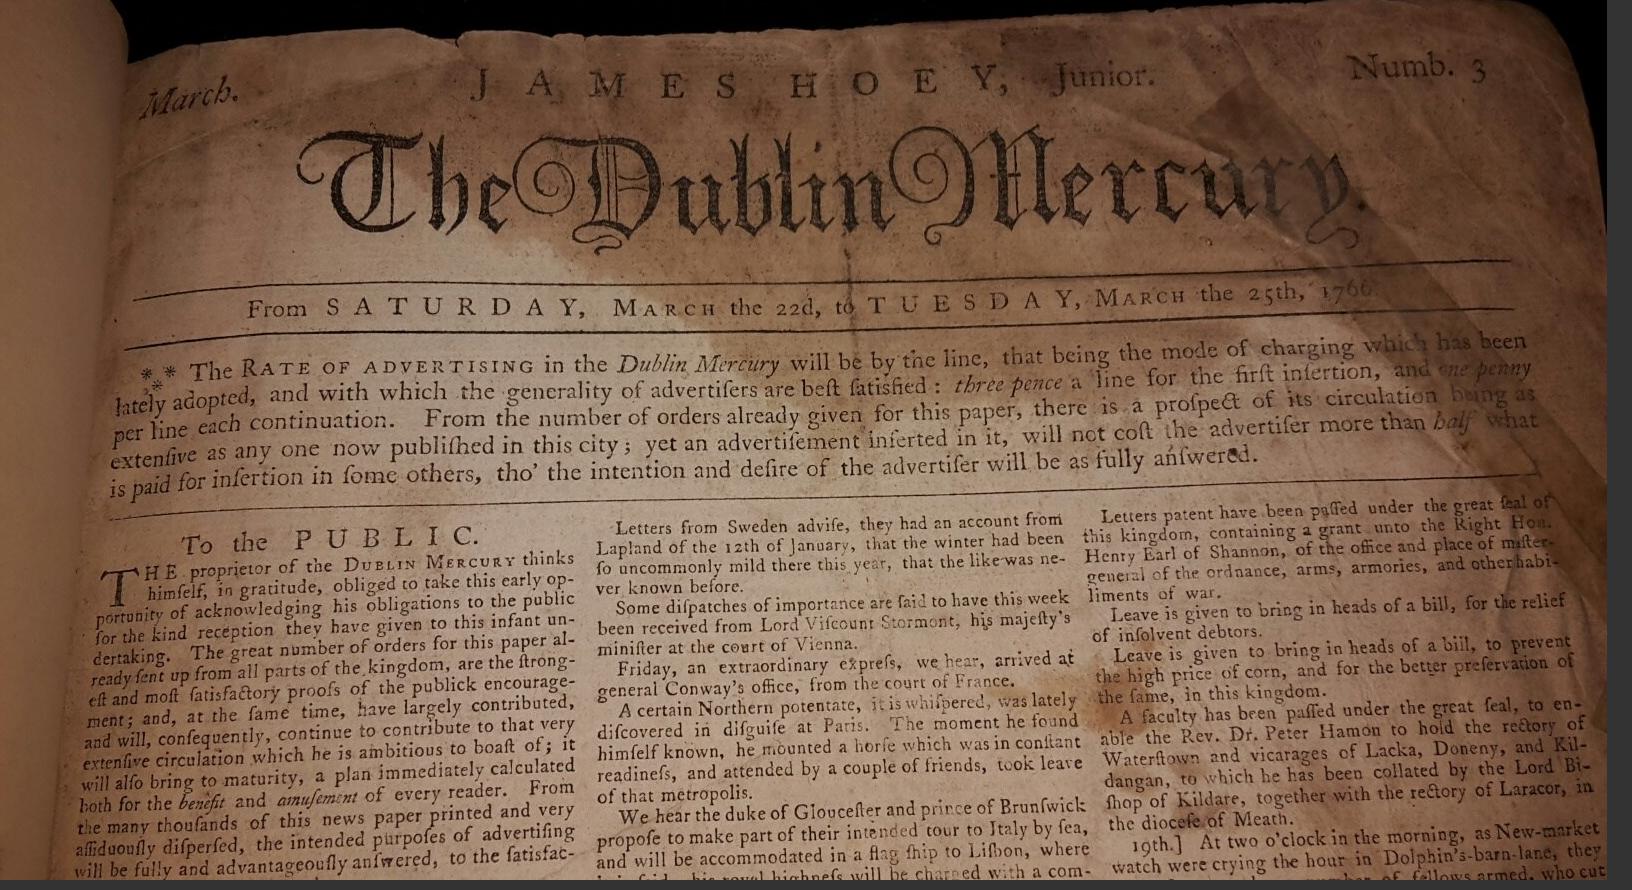 Dublin Mercury